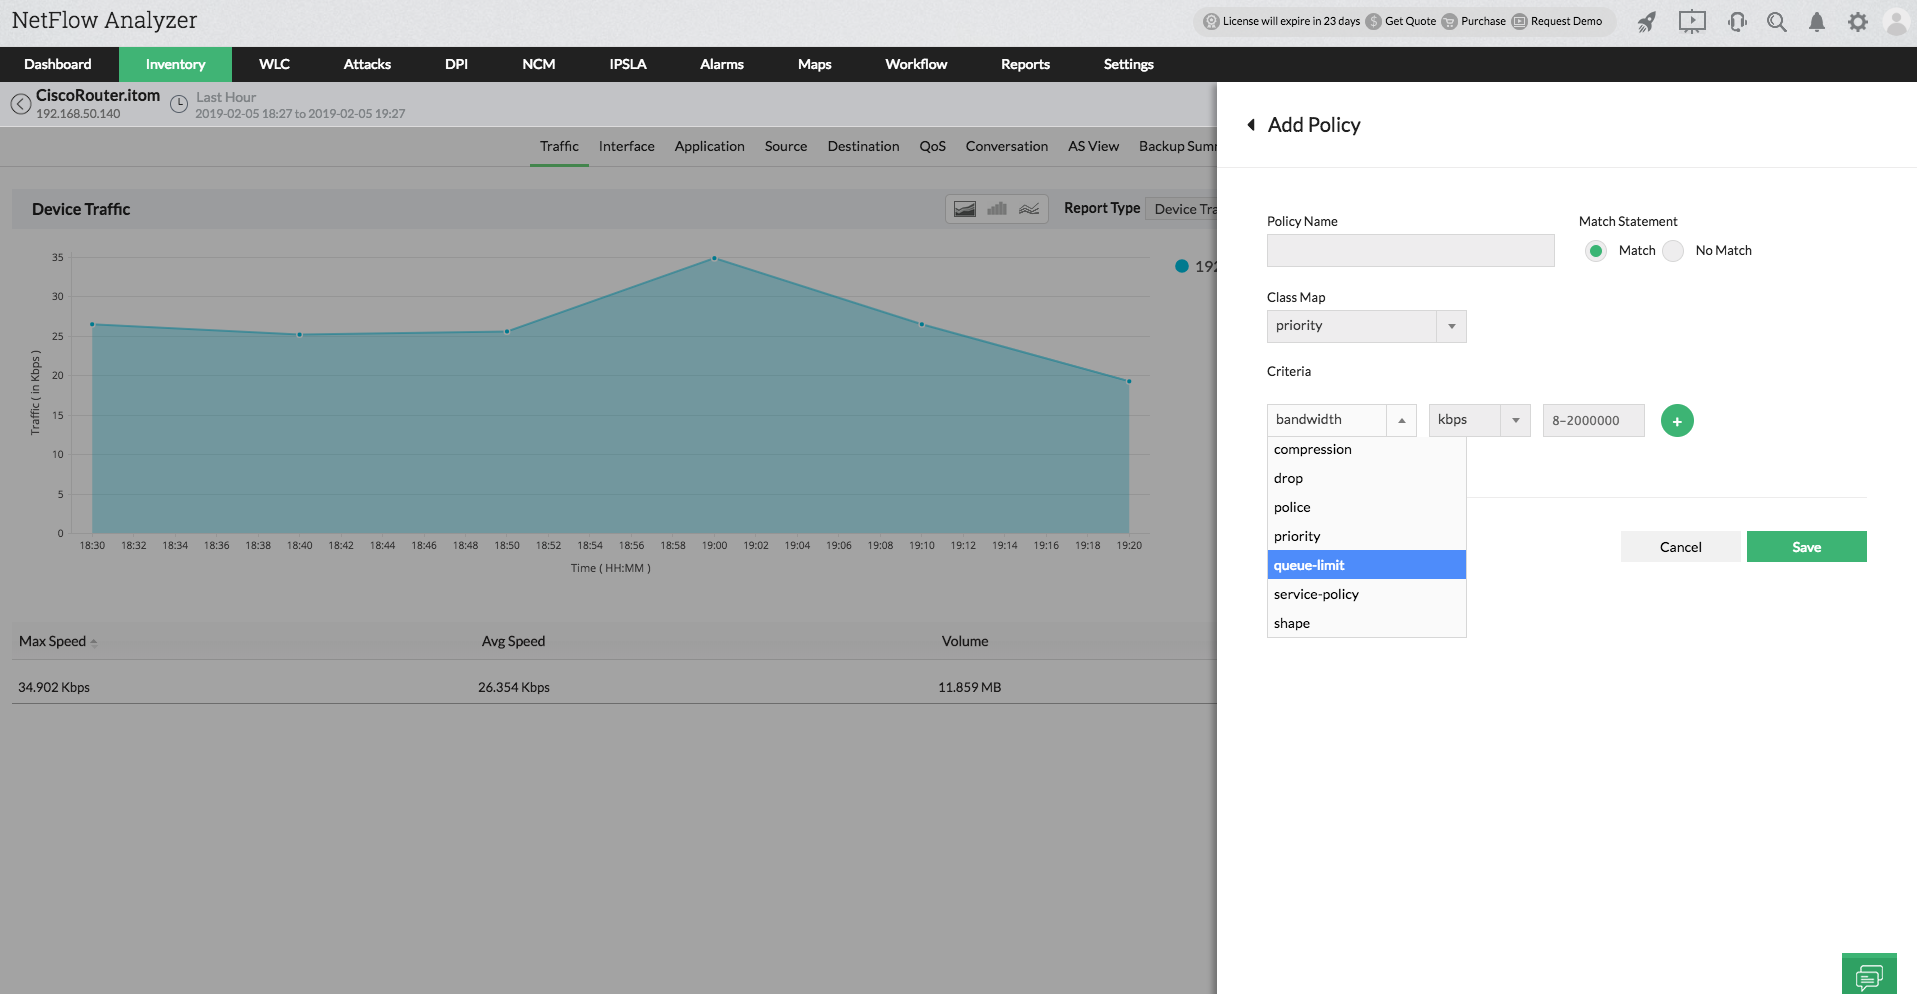 Network Bandwidth Management - ManageEngine NetFlow Analyzer